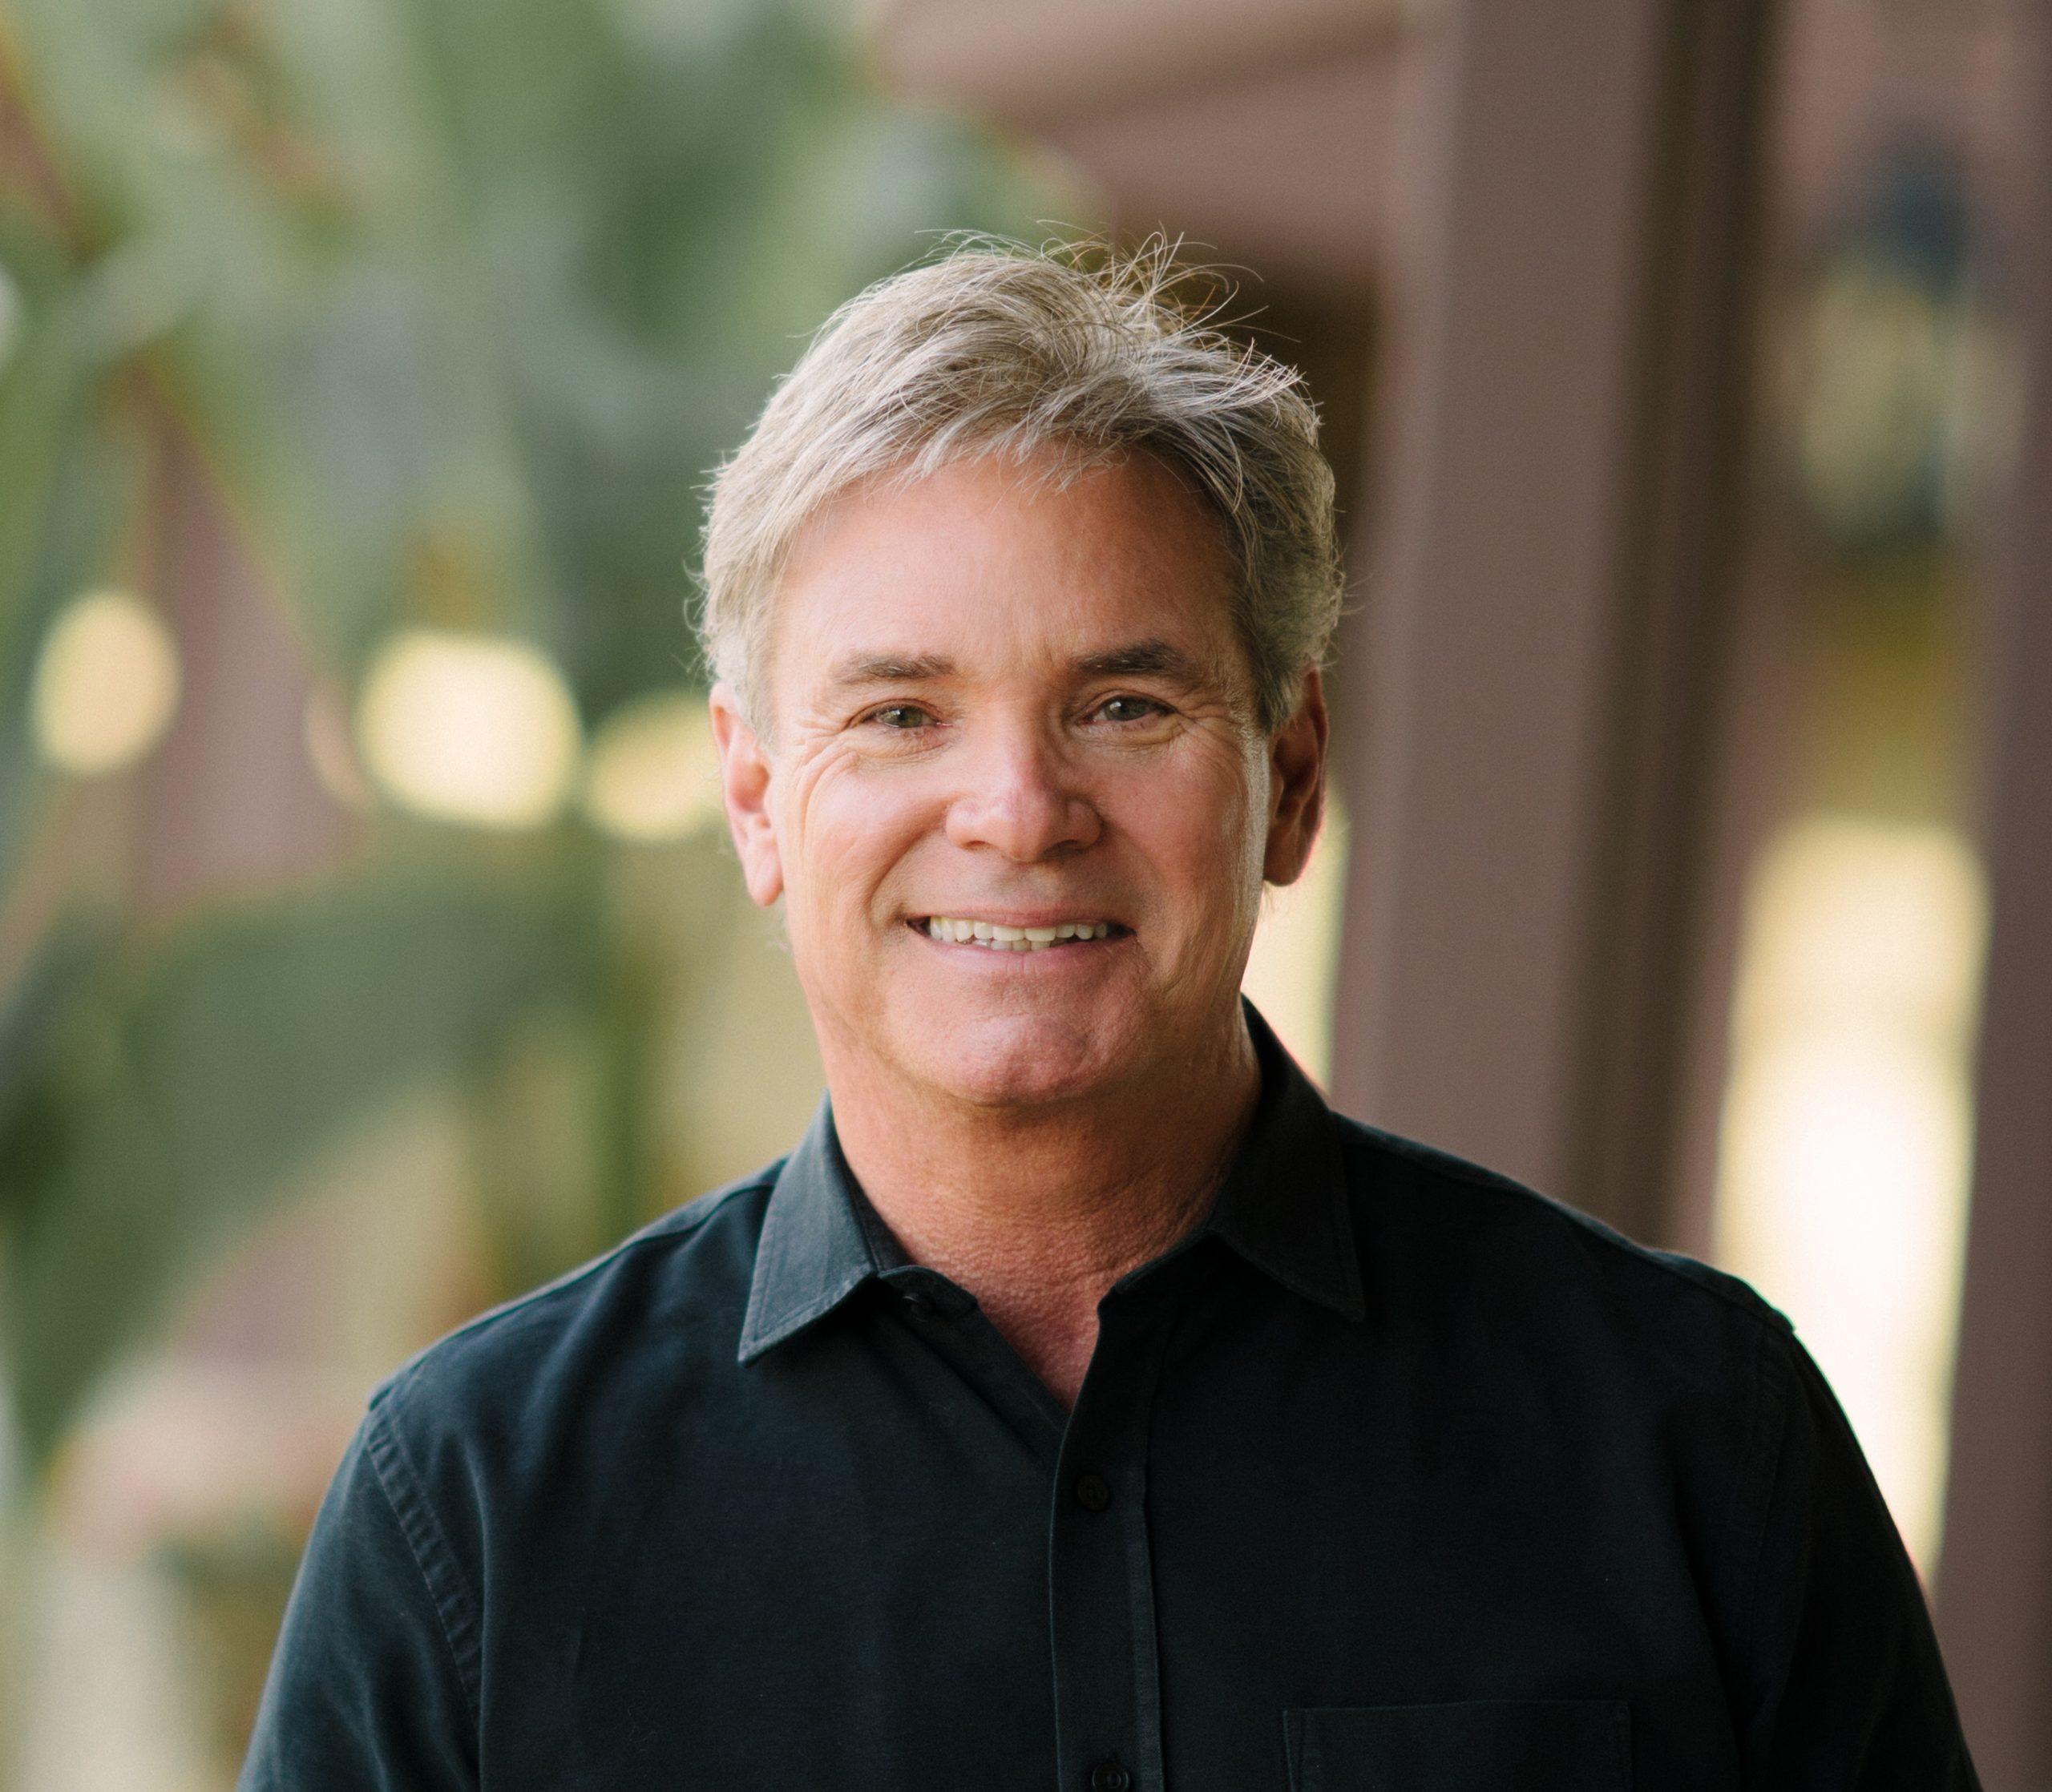 Pastor Jack Hibbs